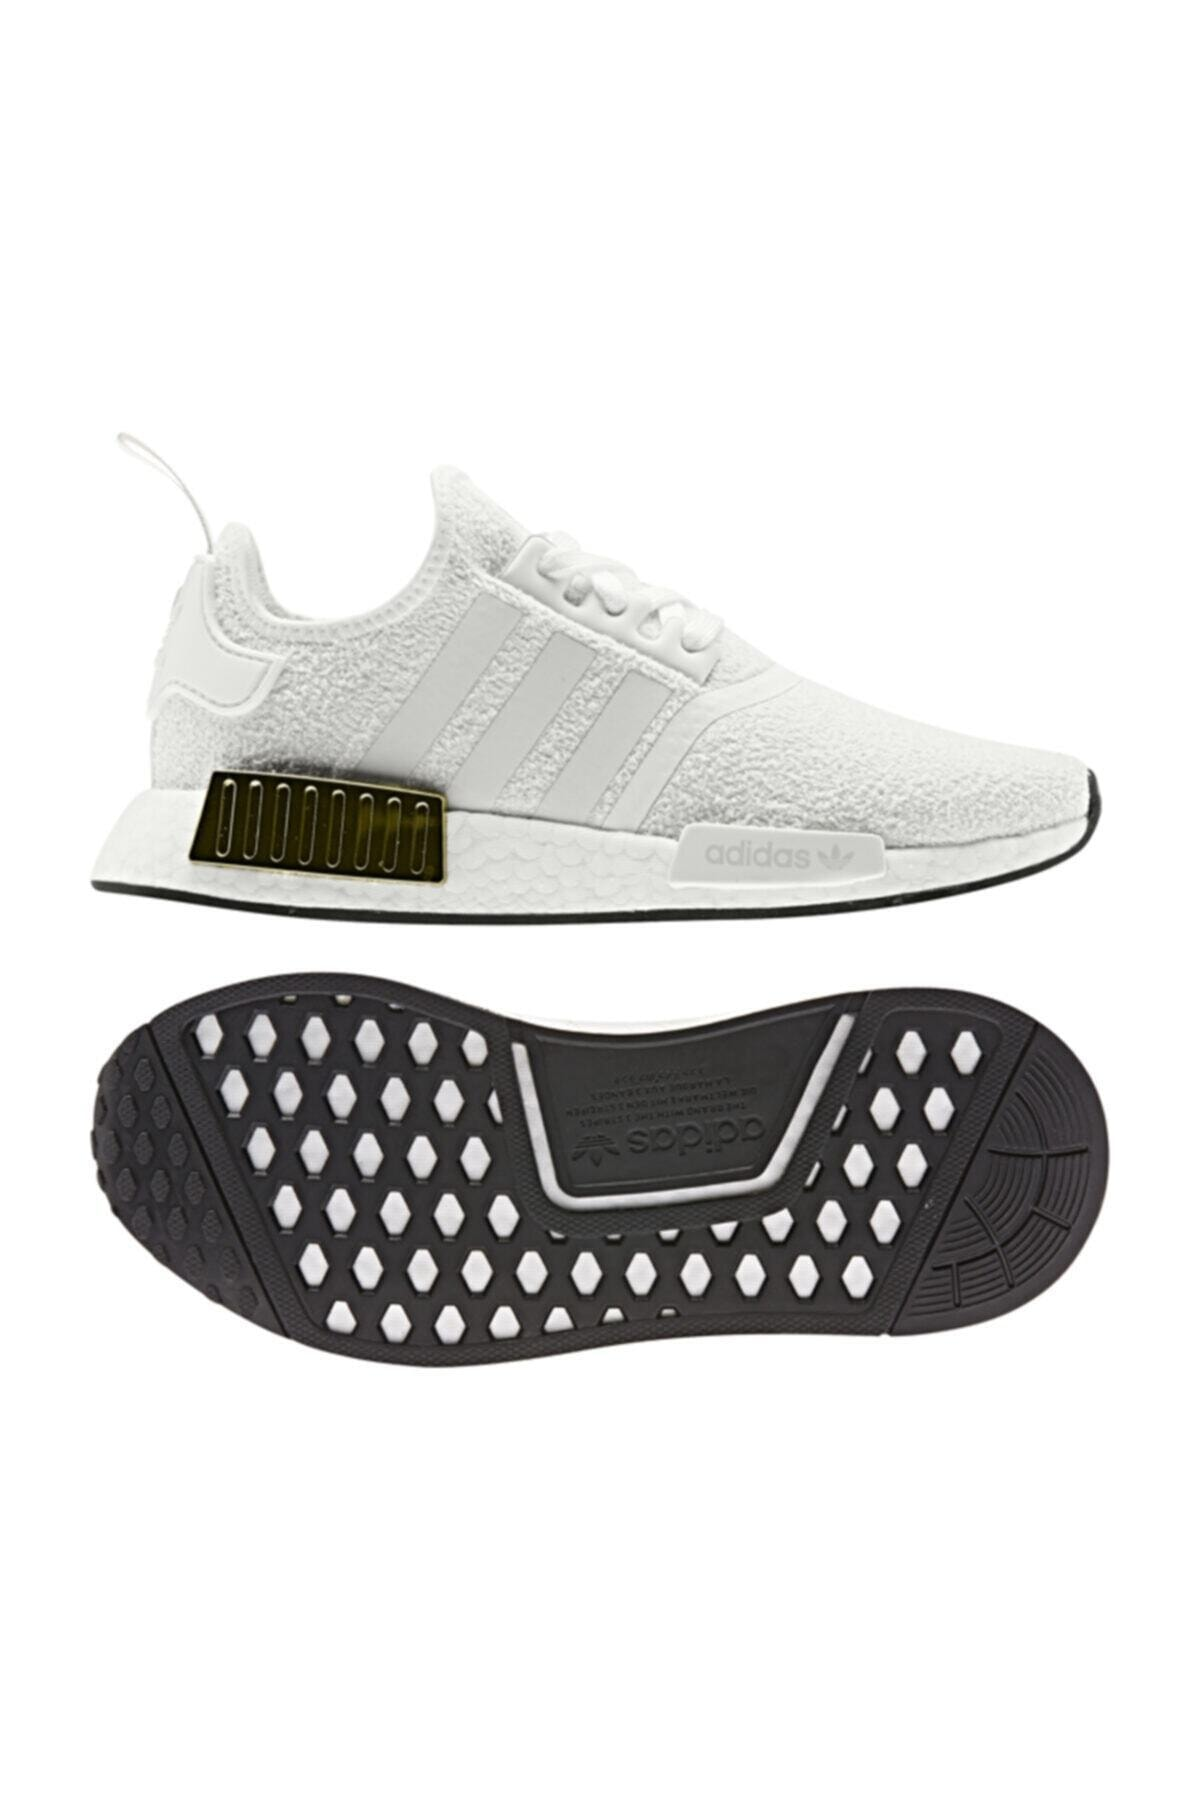 adidas Nmd_r1 W Unisex Krem Sneaker 1